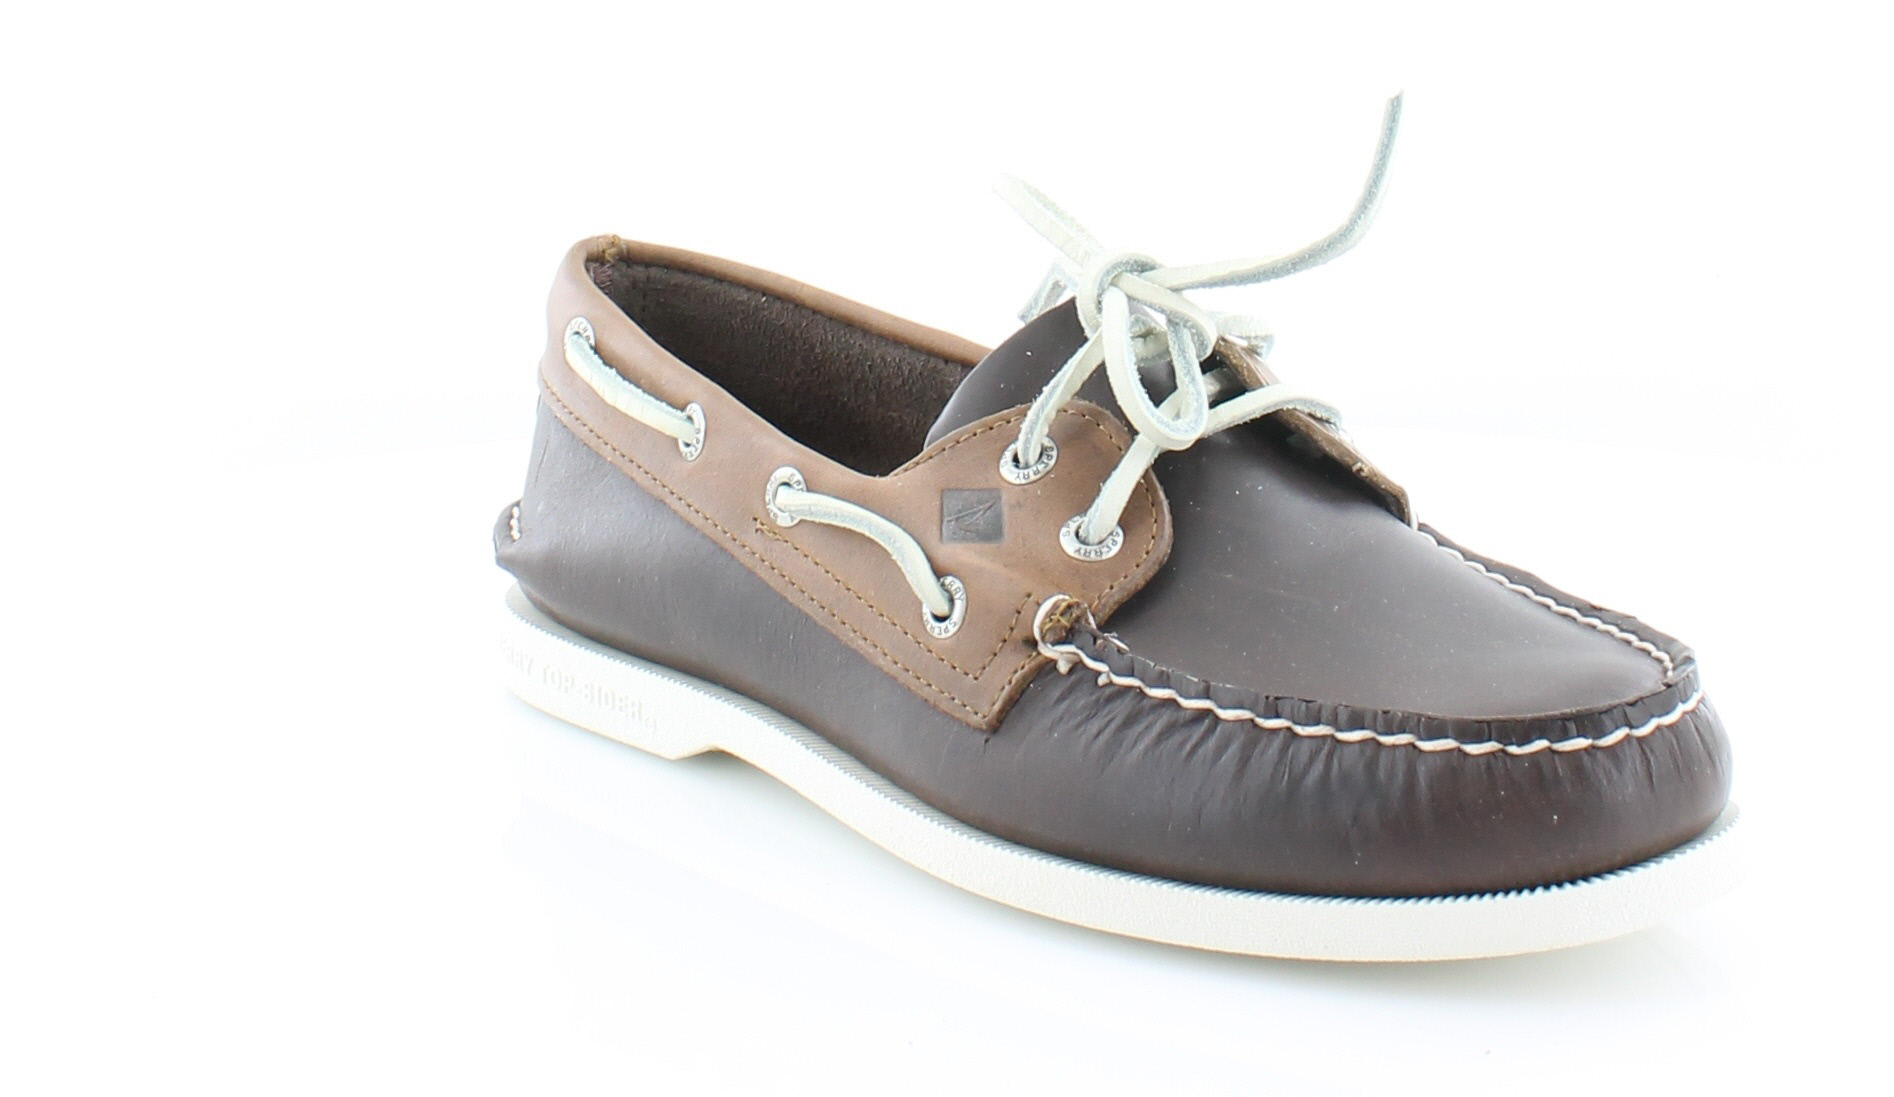 Sperry Top-Sider A O Sarape Women s Loafers   Slip-Ons - Walmart.com